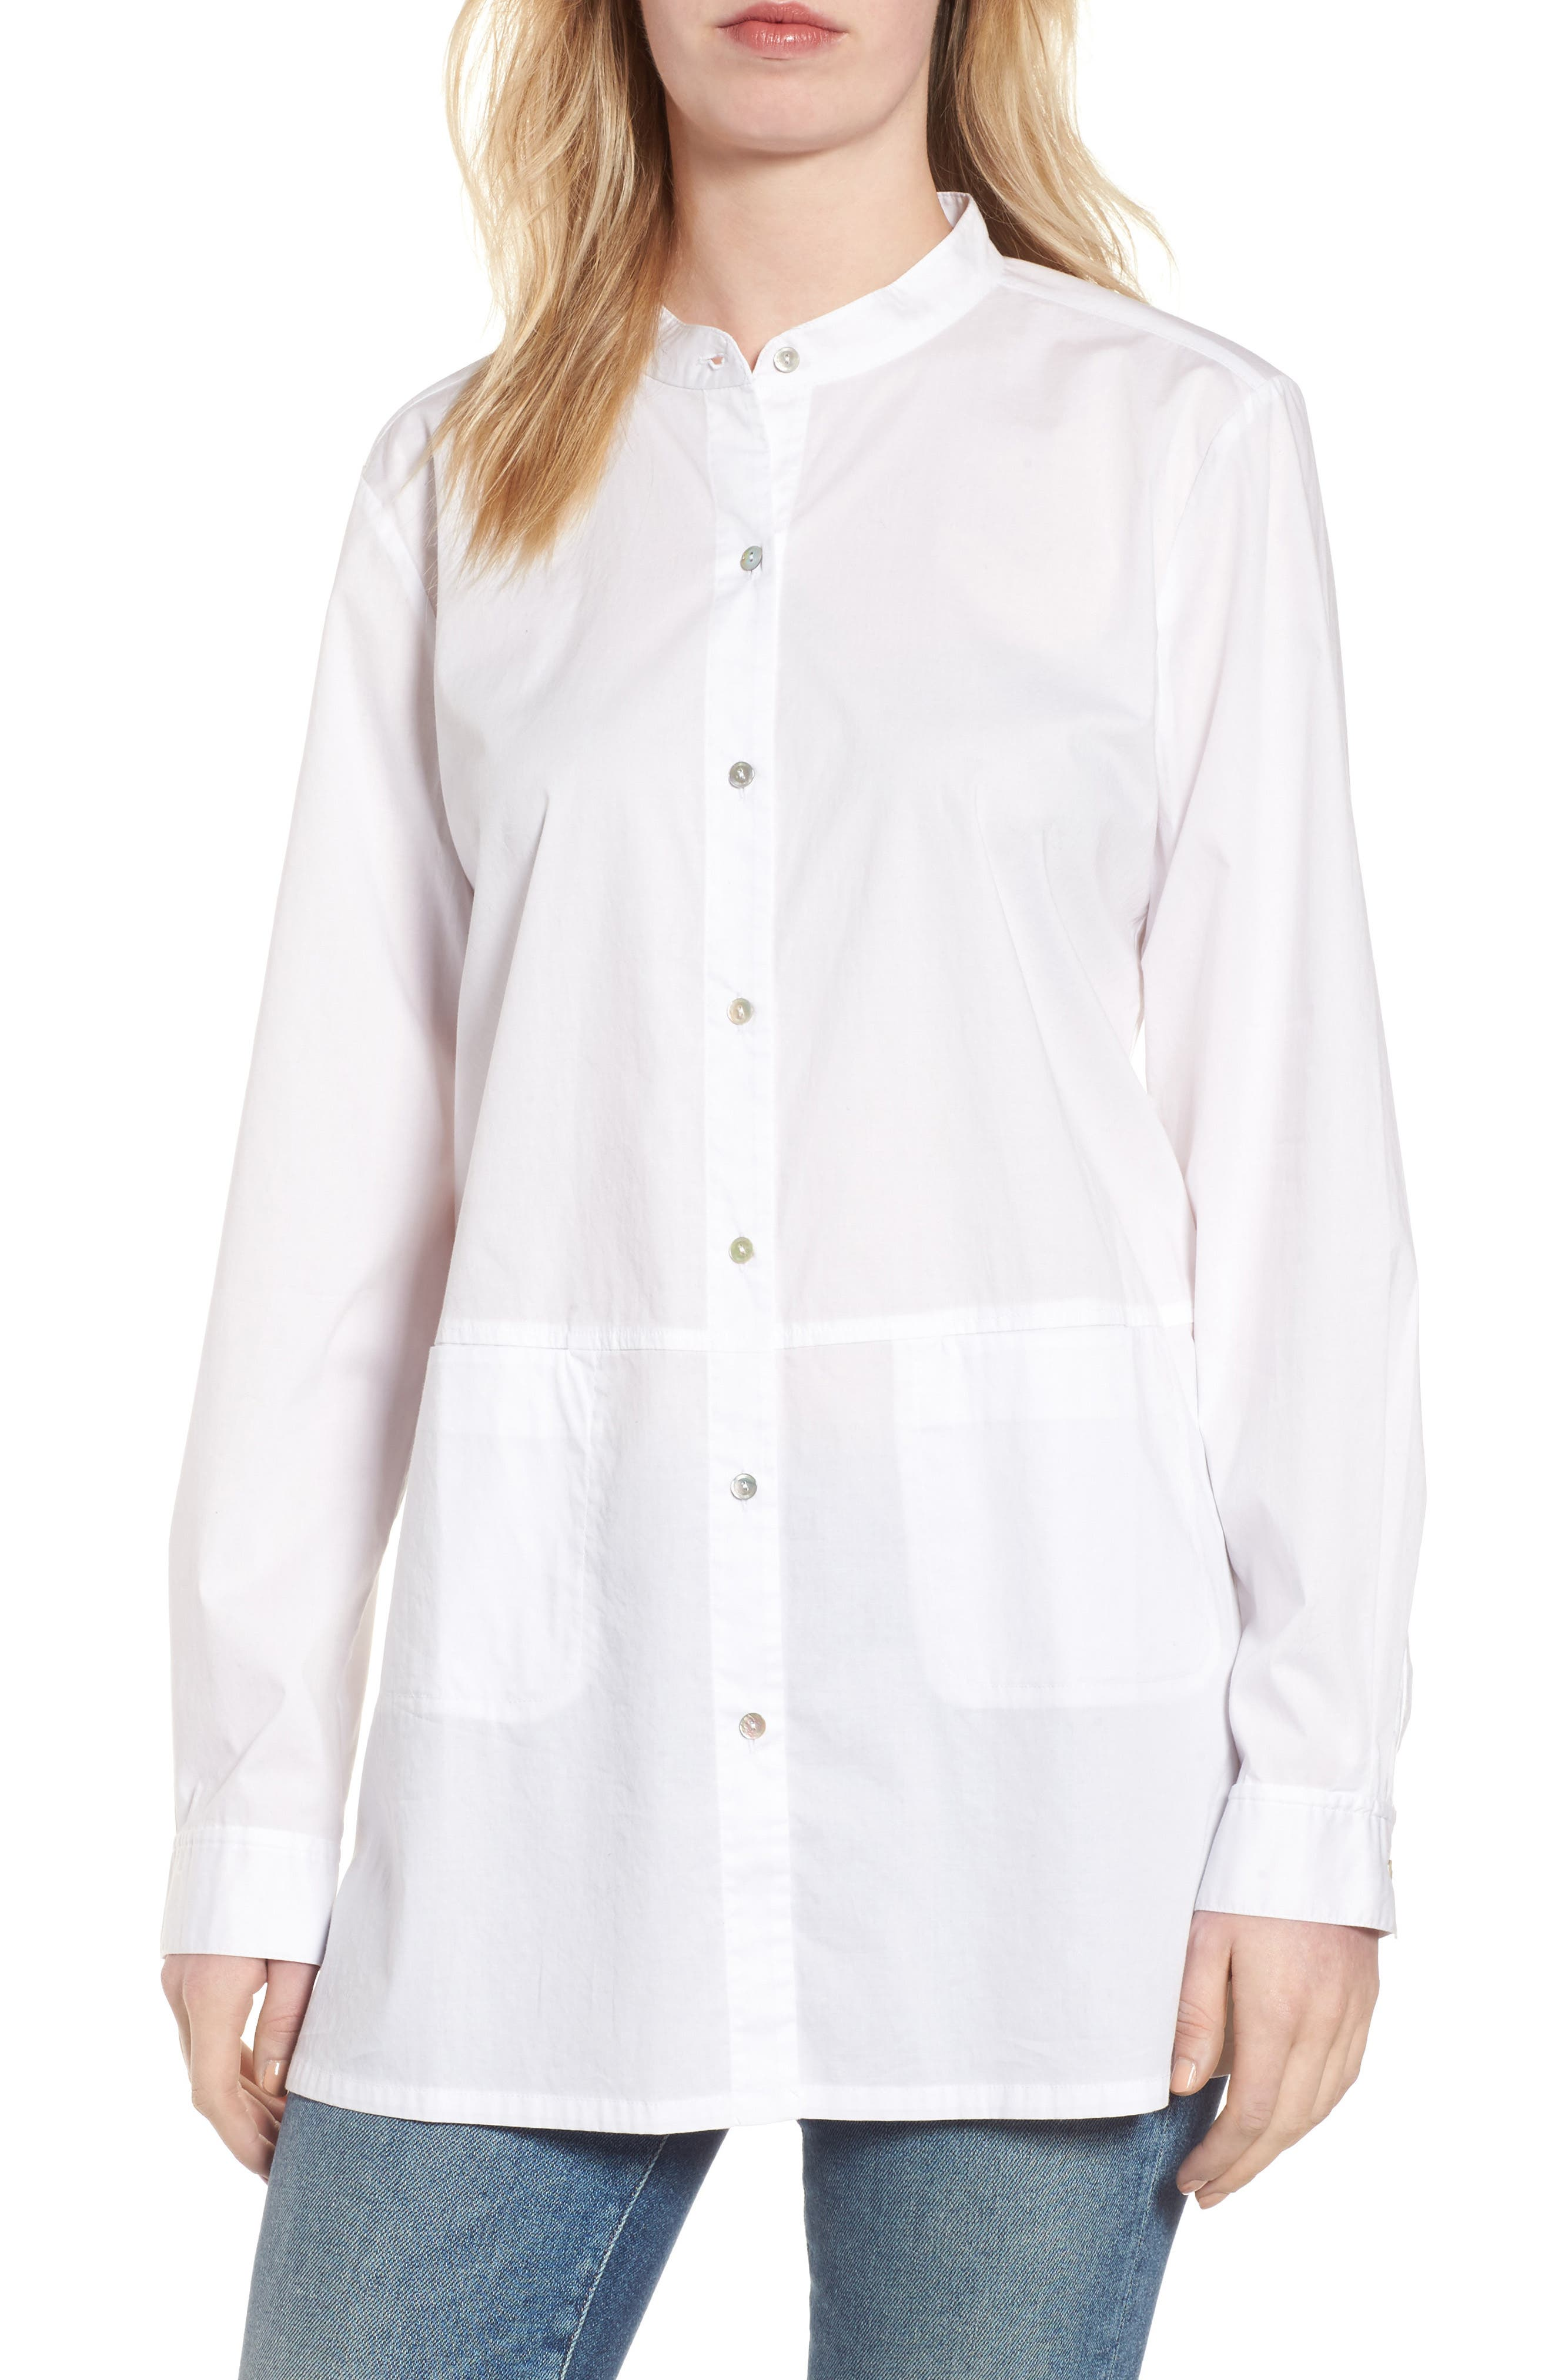 Stretch Organic Cotton Shirt,                             Main thumbnail 1, color,                             White